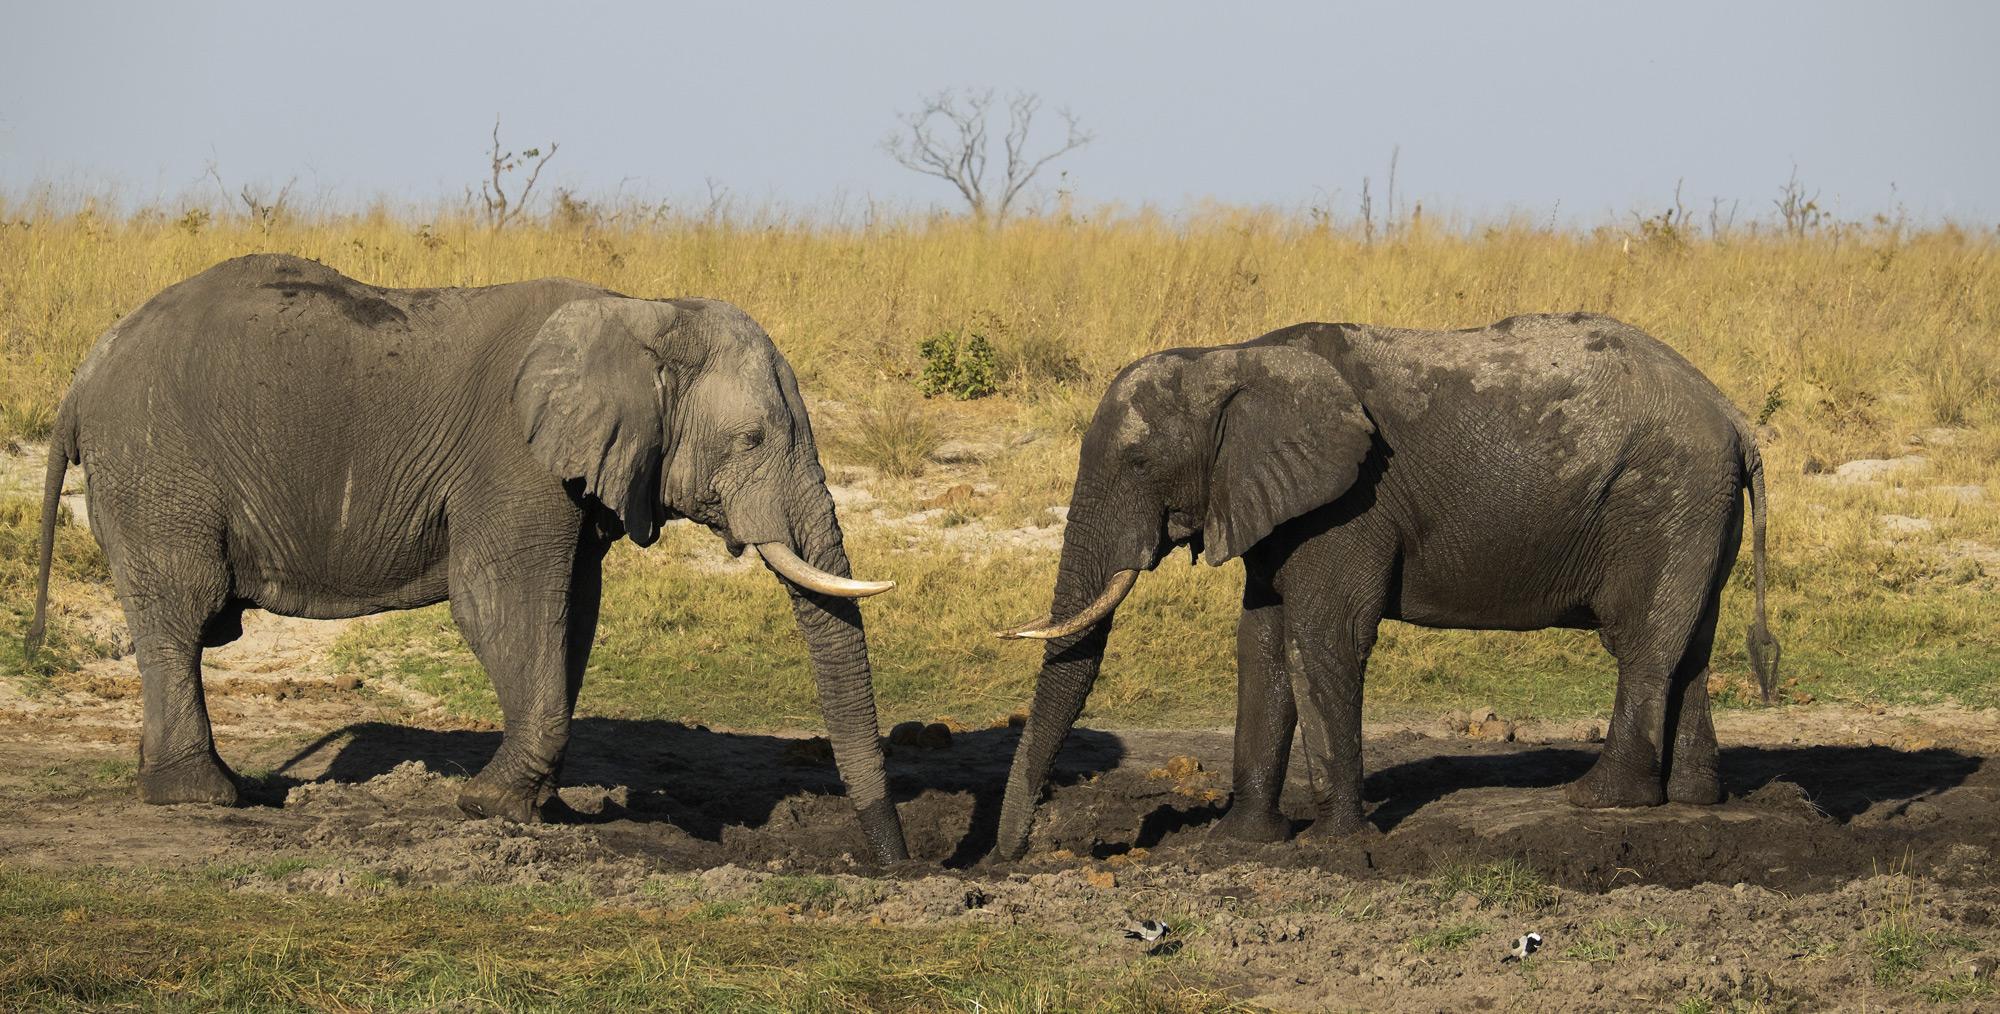 Elephant Mirror, Elephant Sands, Botswana, Africa, sparring, waterhole, evening, game drive, elephant, males, mirrored, , photo